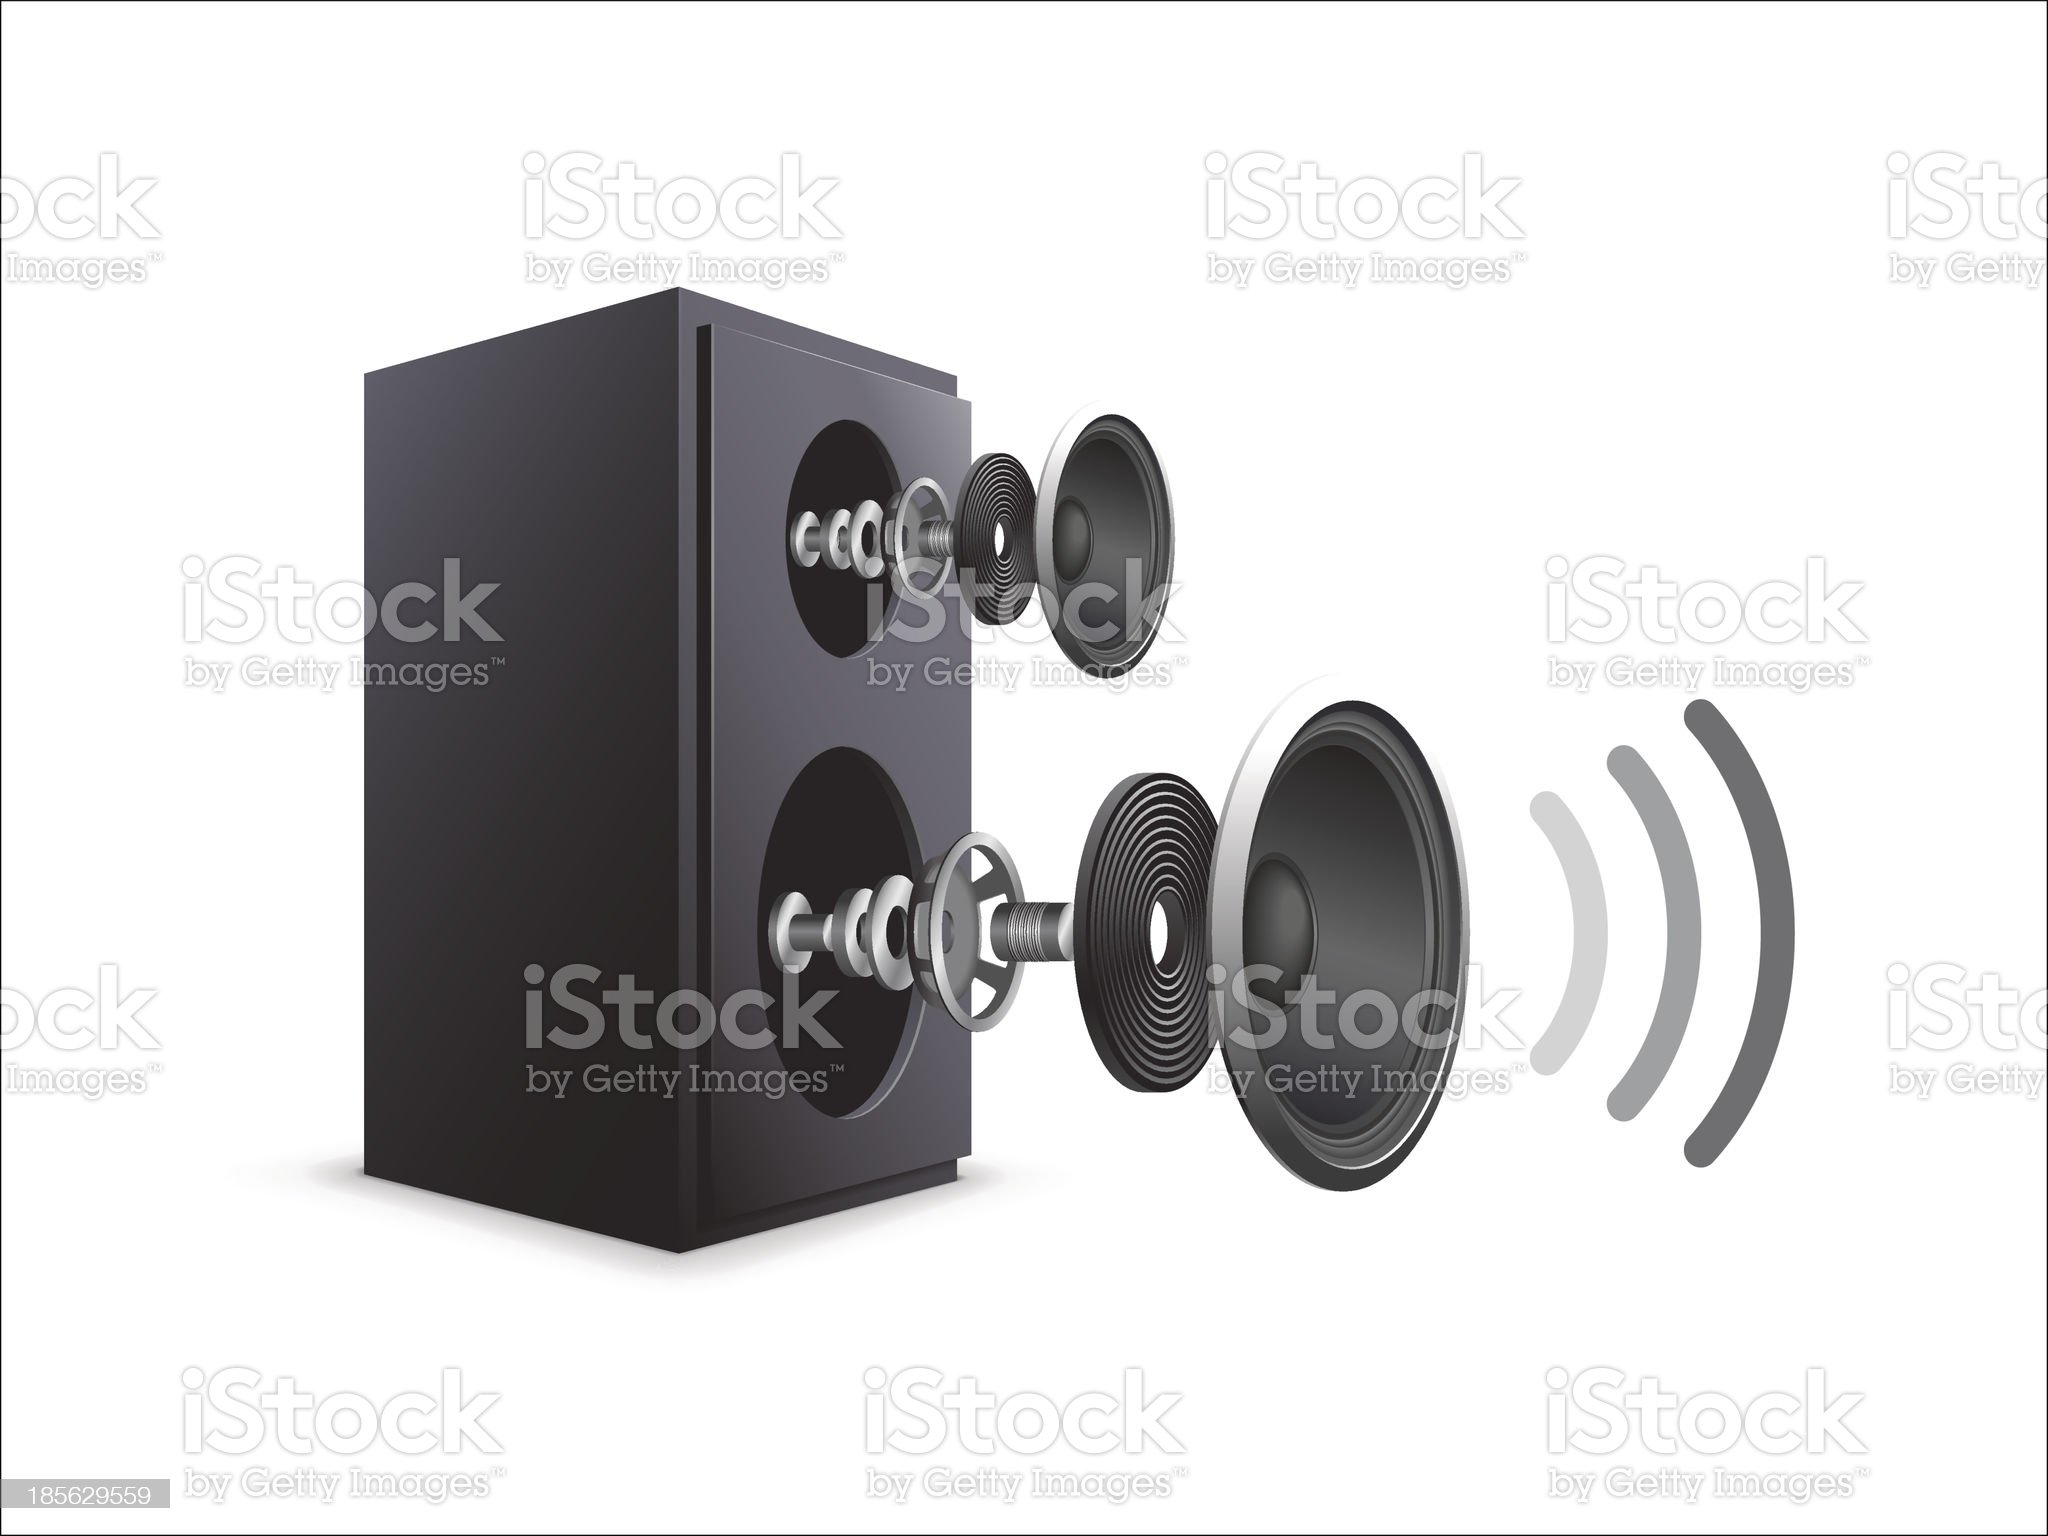 Speaker Components royalty-free stock vector art